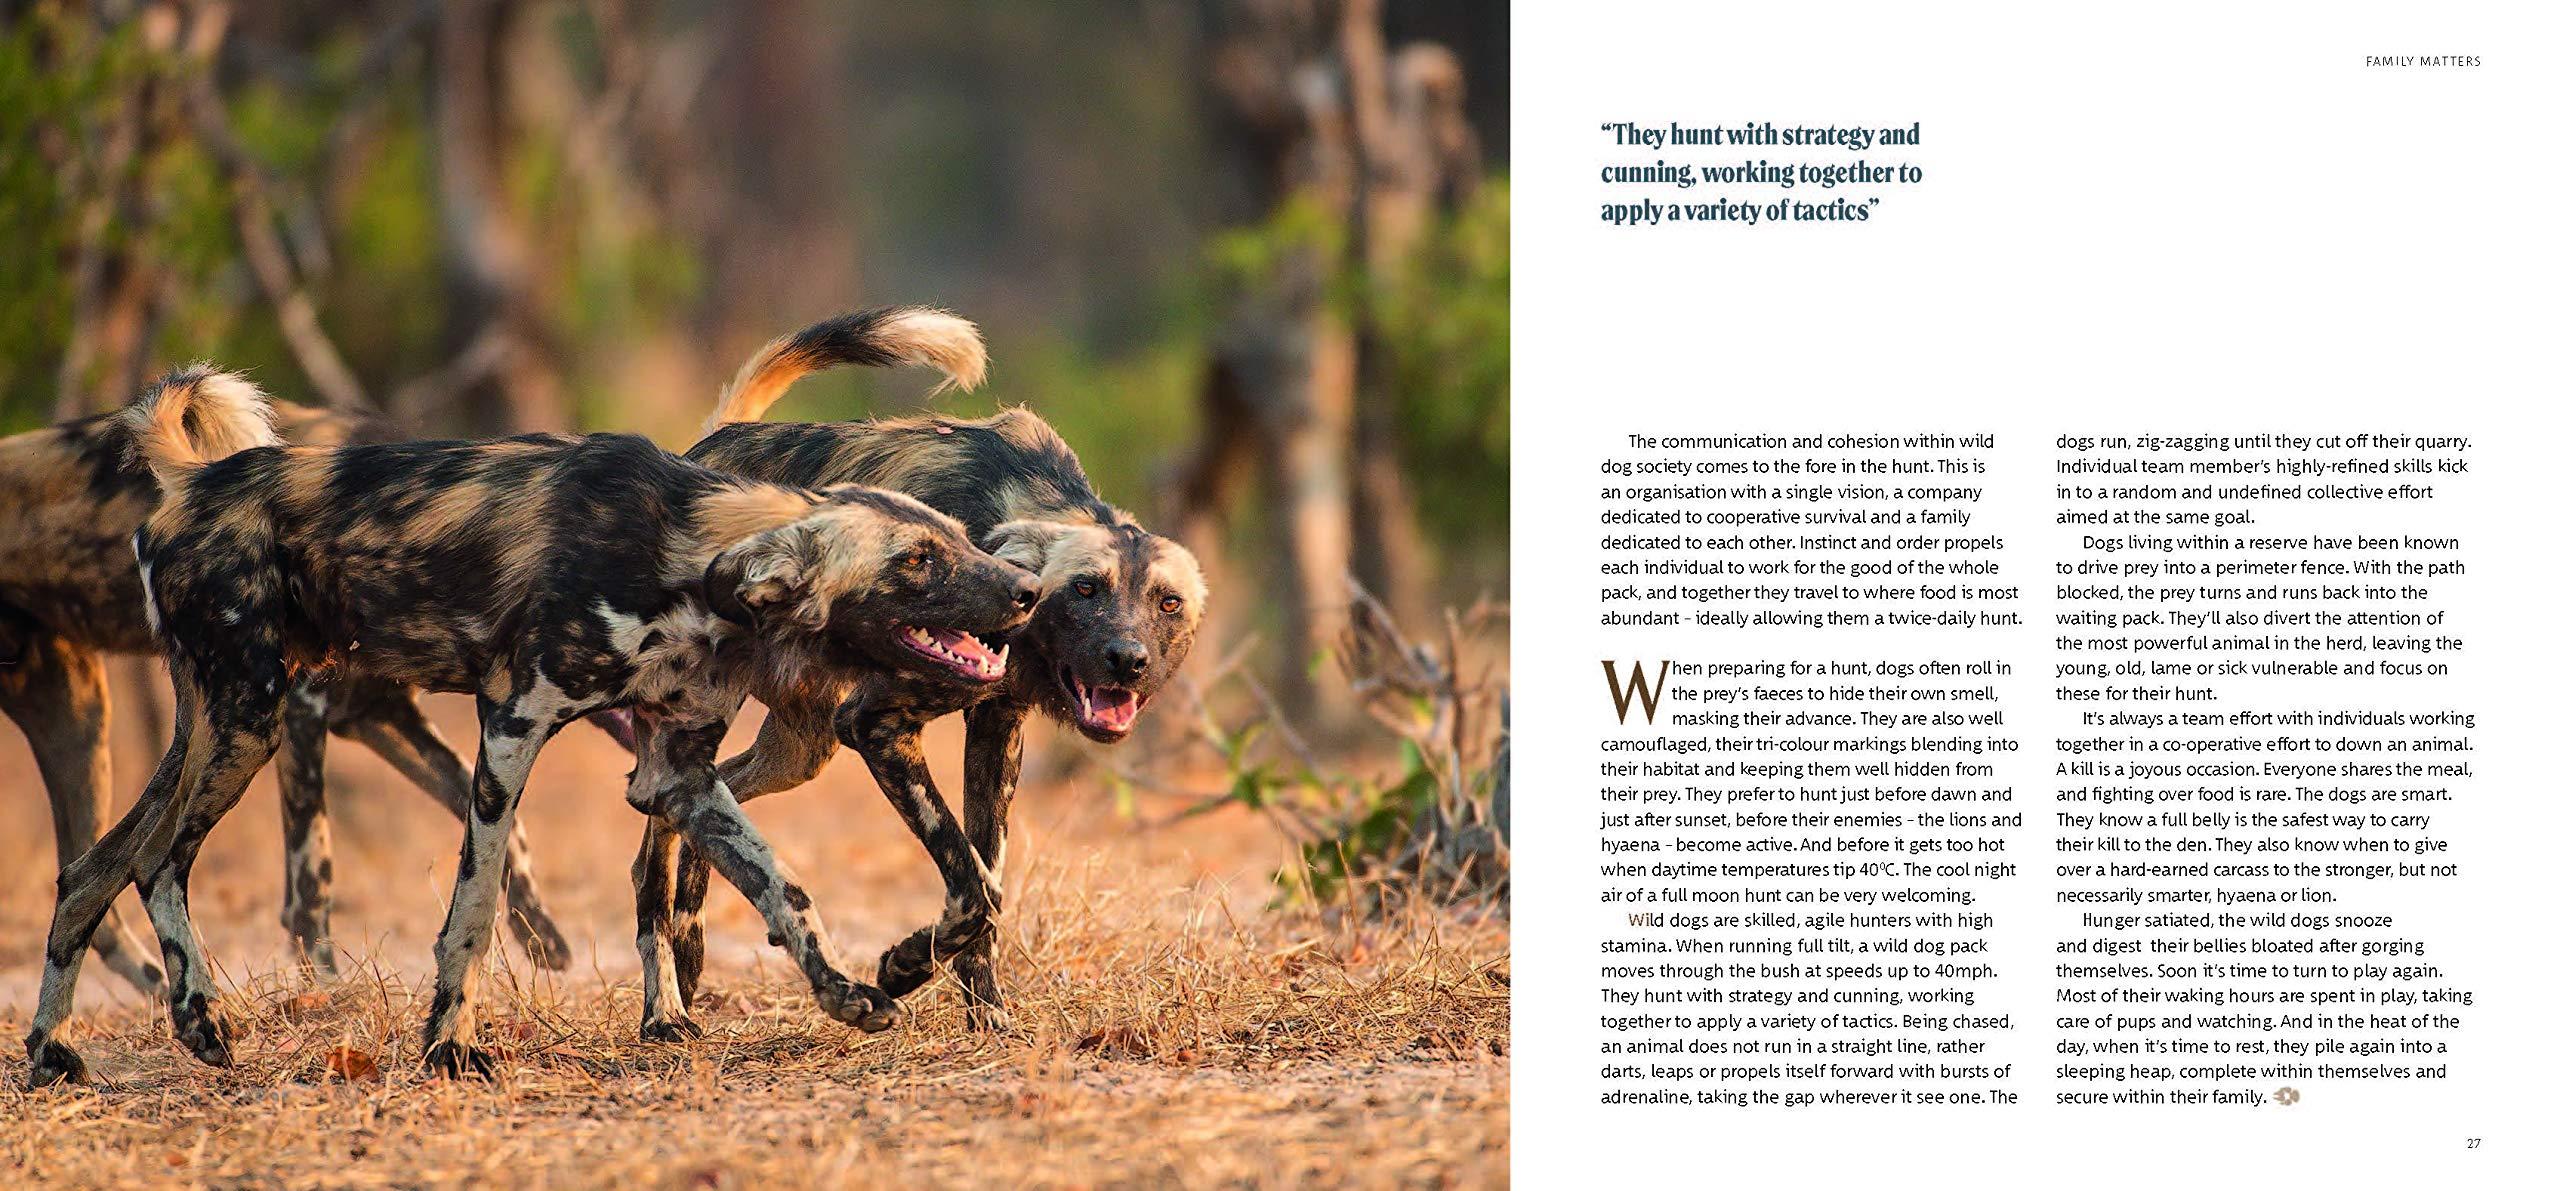 Africa S Wild Dogs A Survival Story Kagan Jocelin 9781913159191 Amazon Com Books